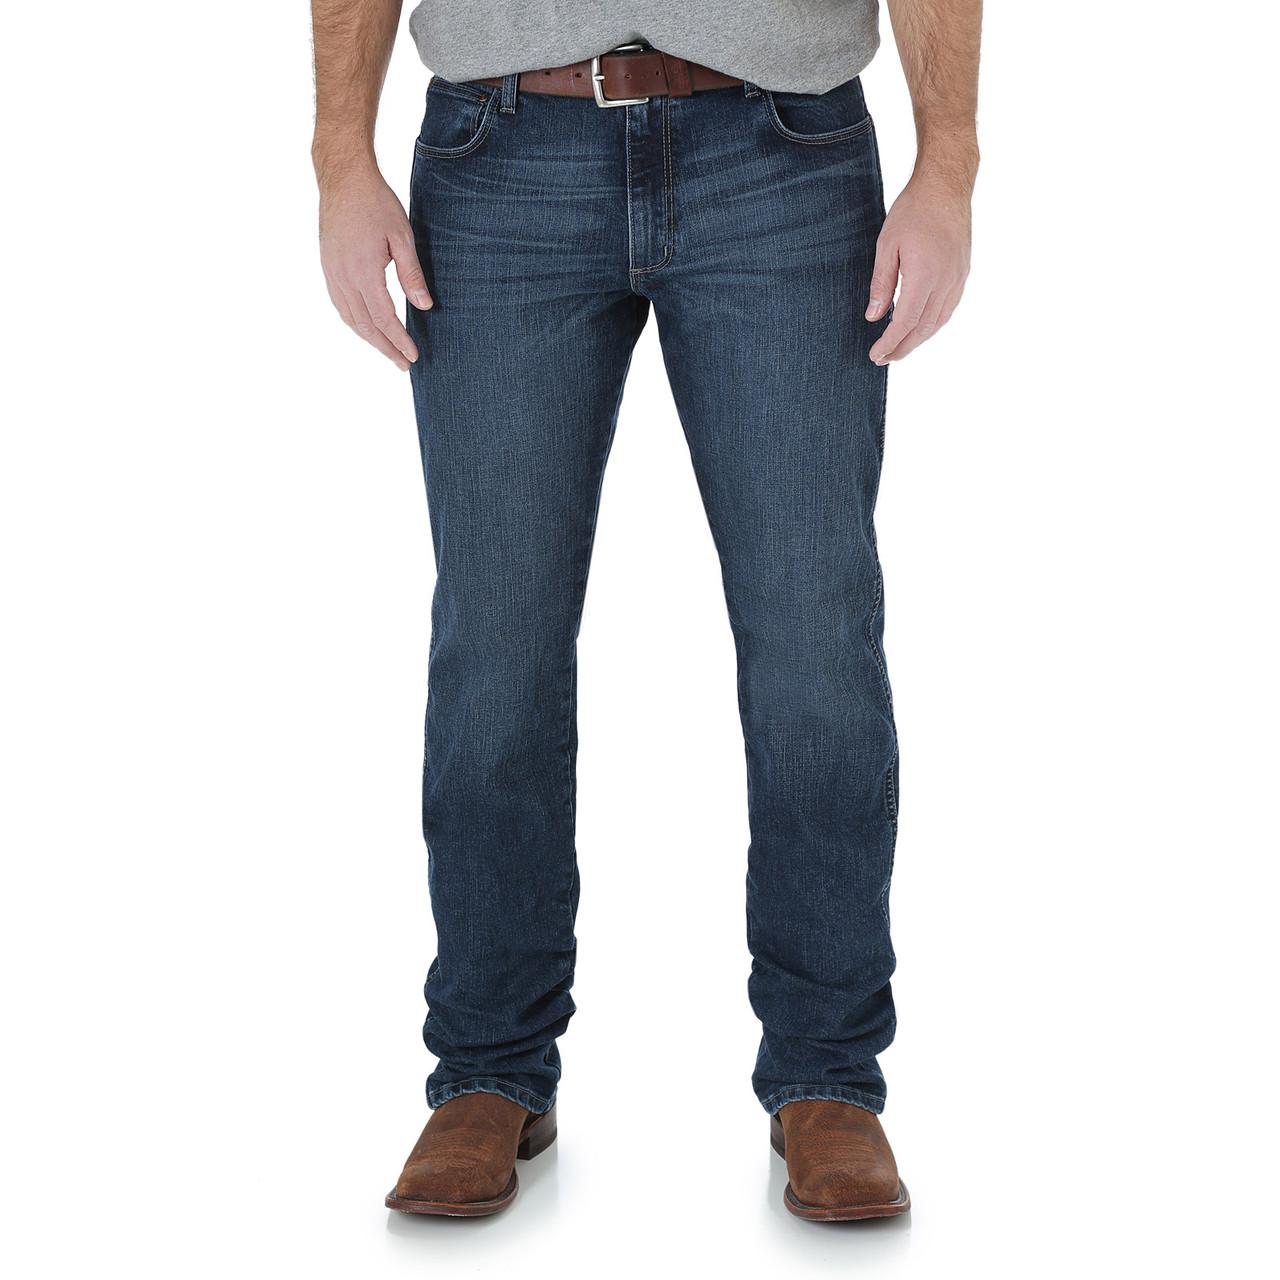 Джинсы Wrangler Retro Slim Fit Straight Leg, Amarillo, 31W32L, 88MWZAM